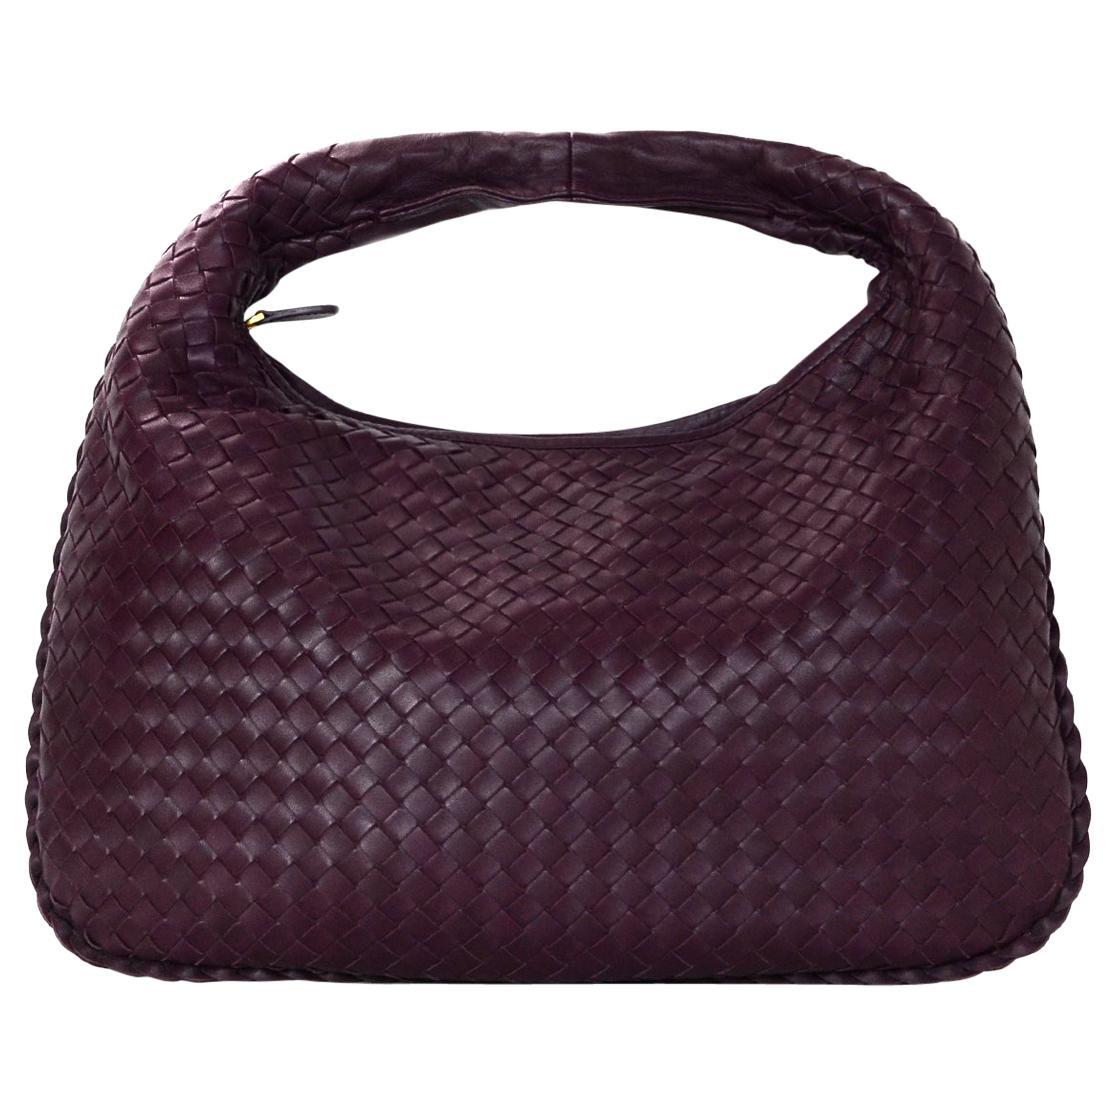 75f11e610862 Vintage and Designer Bags - 23